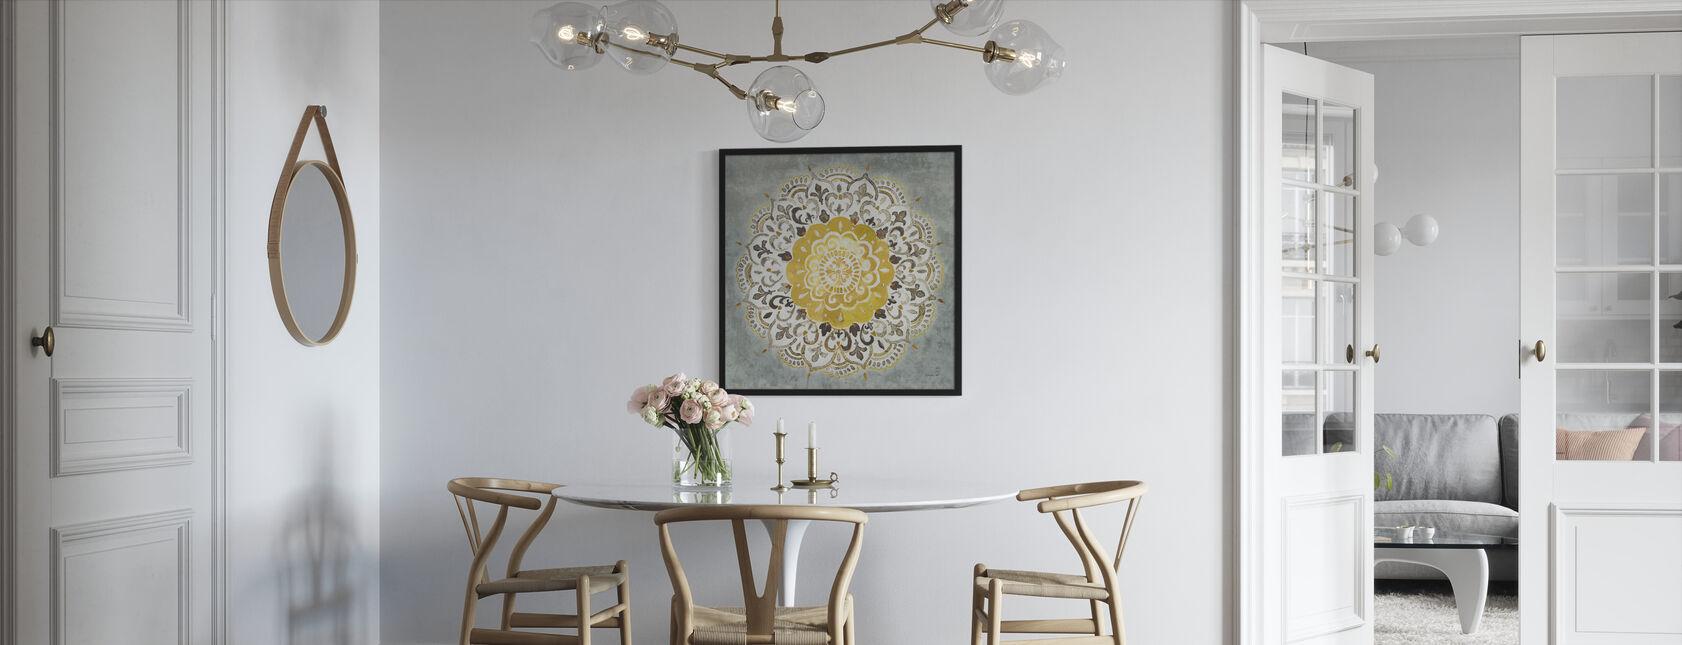 Mandala Delight - Gelb Grau - Gerahmtes bild - Küchen